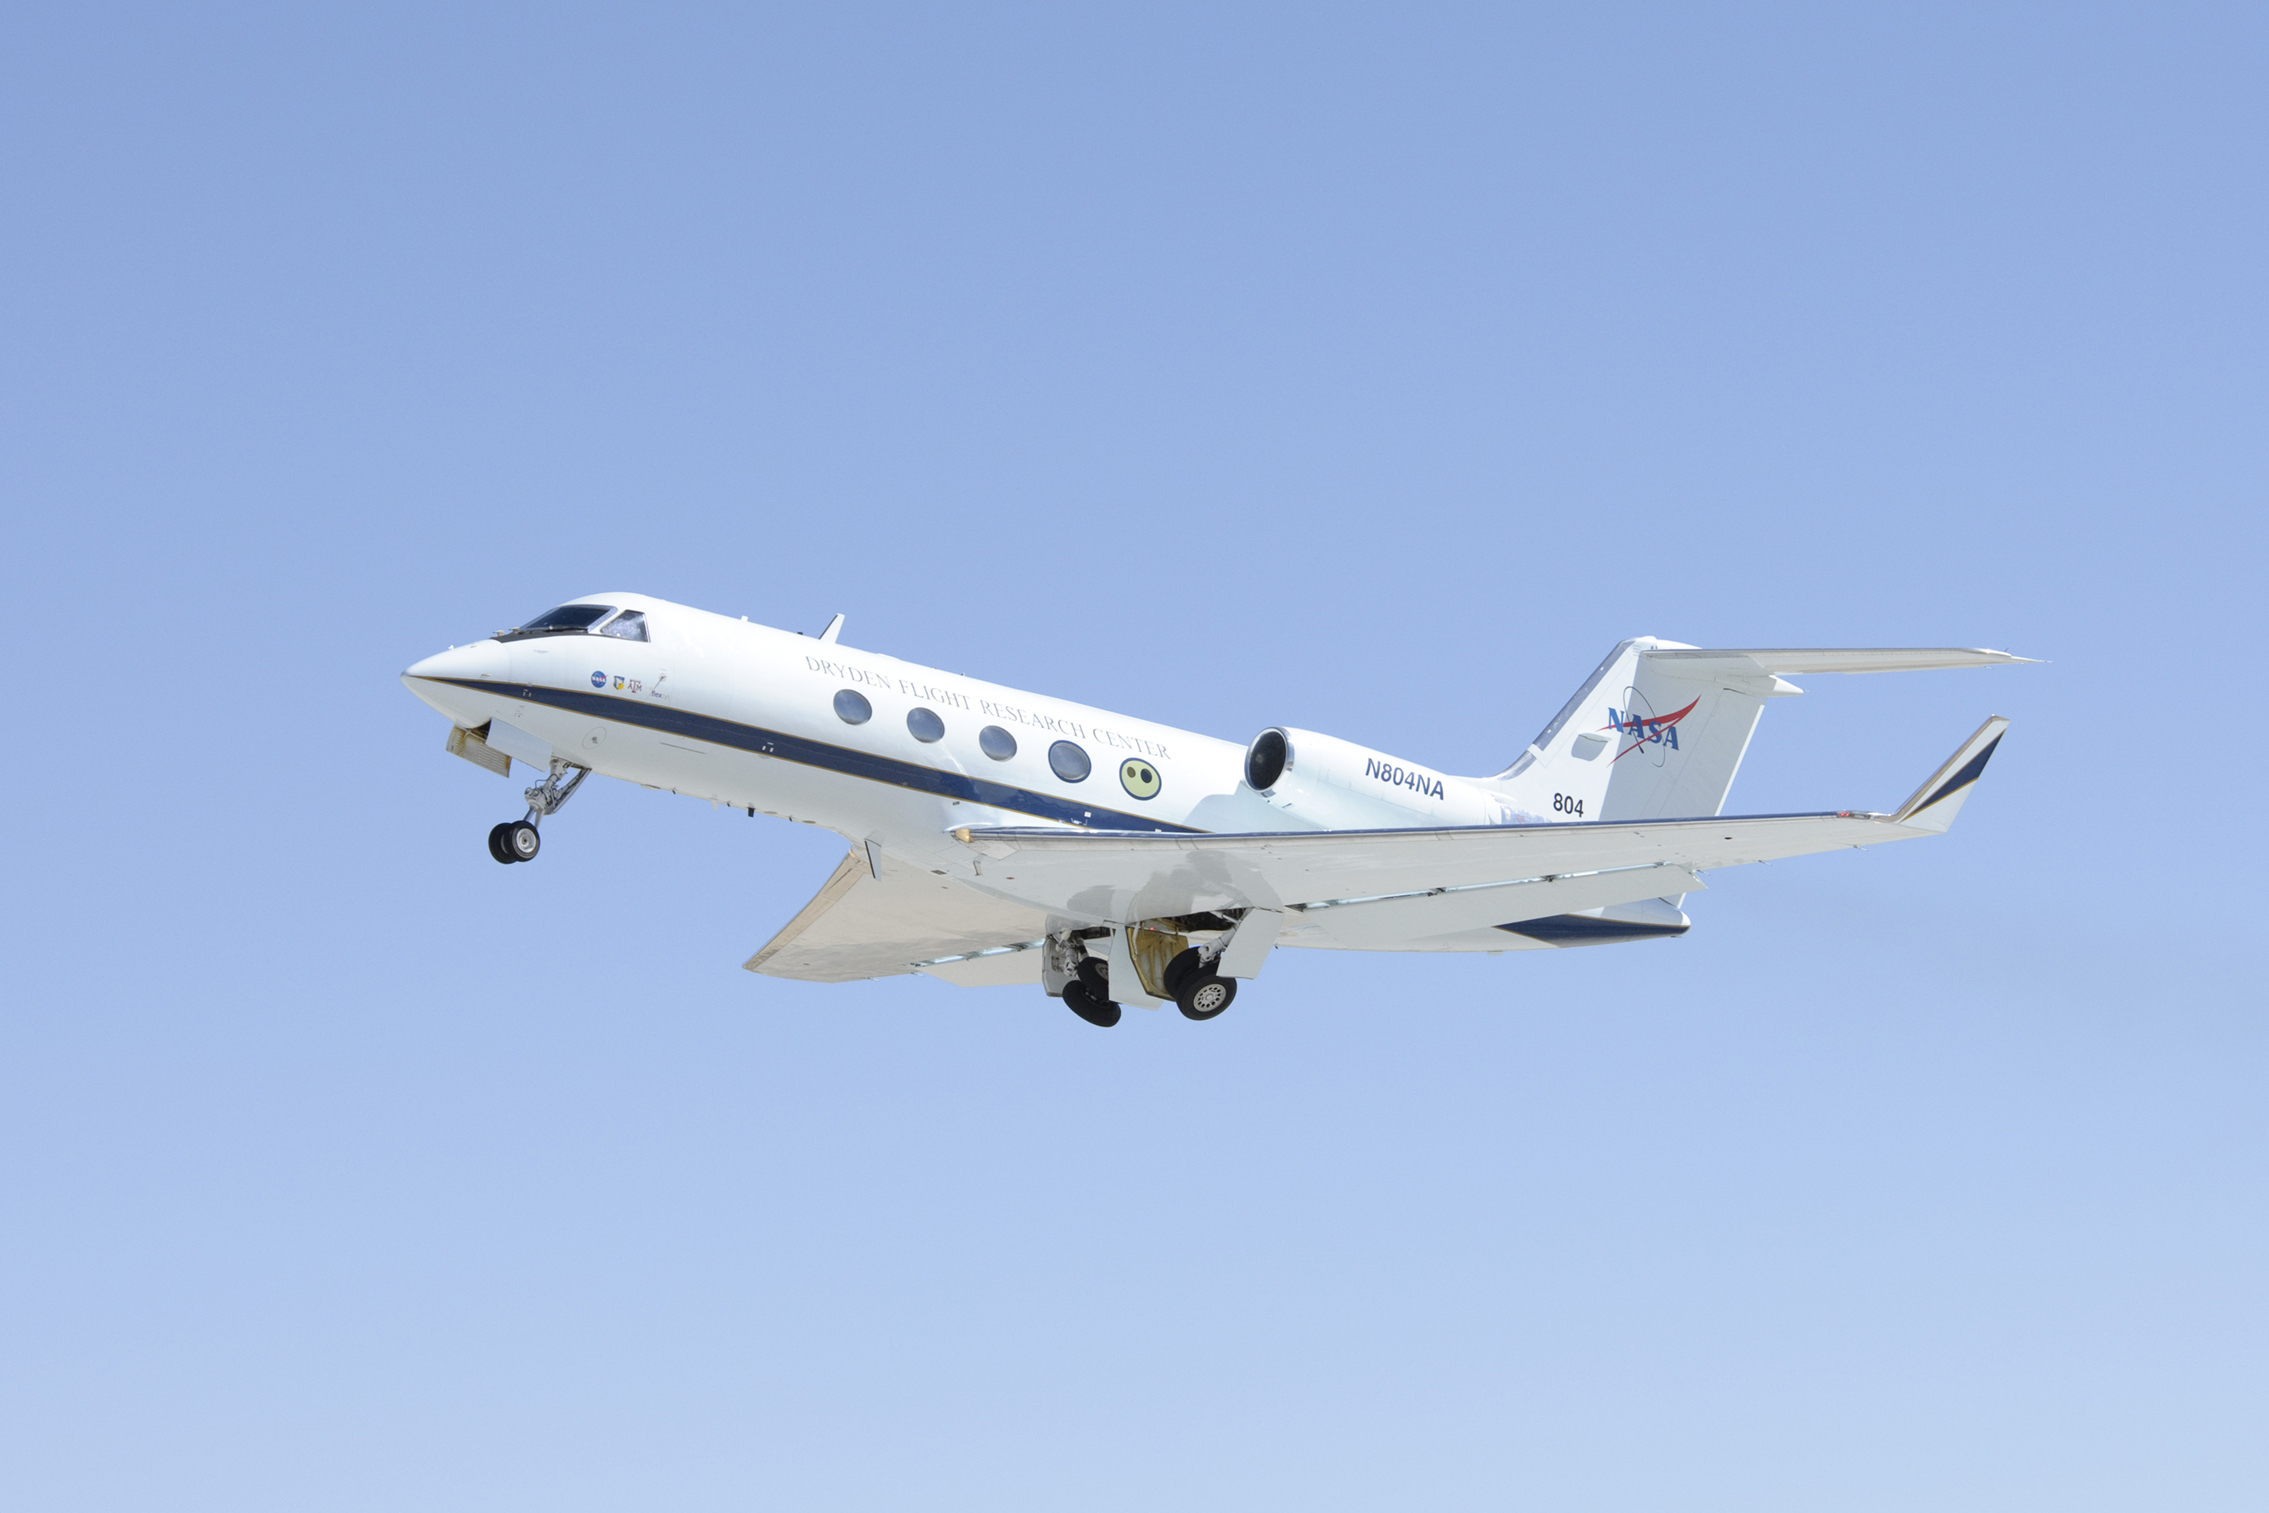 adaptive compliant trailing edge flight experiment nasa